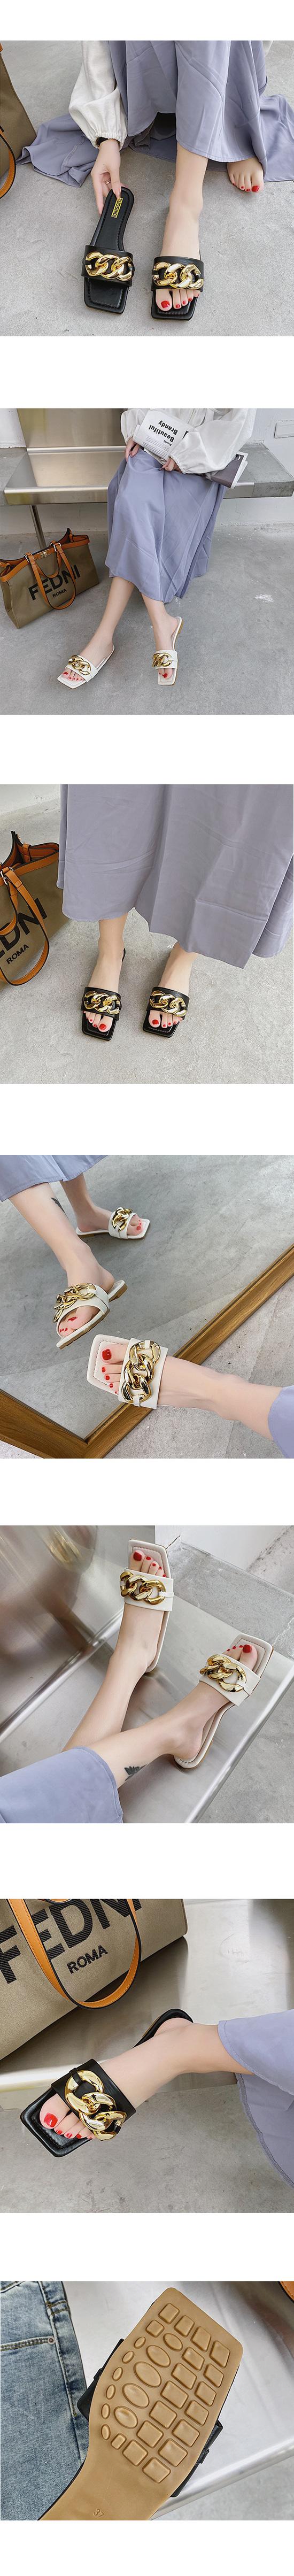 Square Toe Gold Chain Slippers White